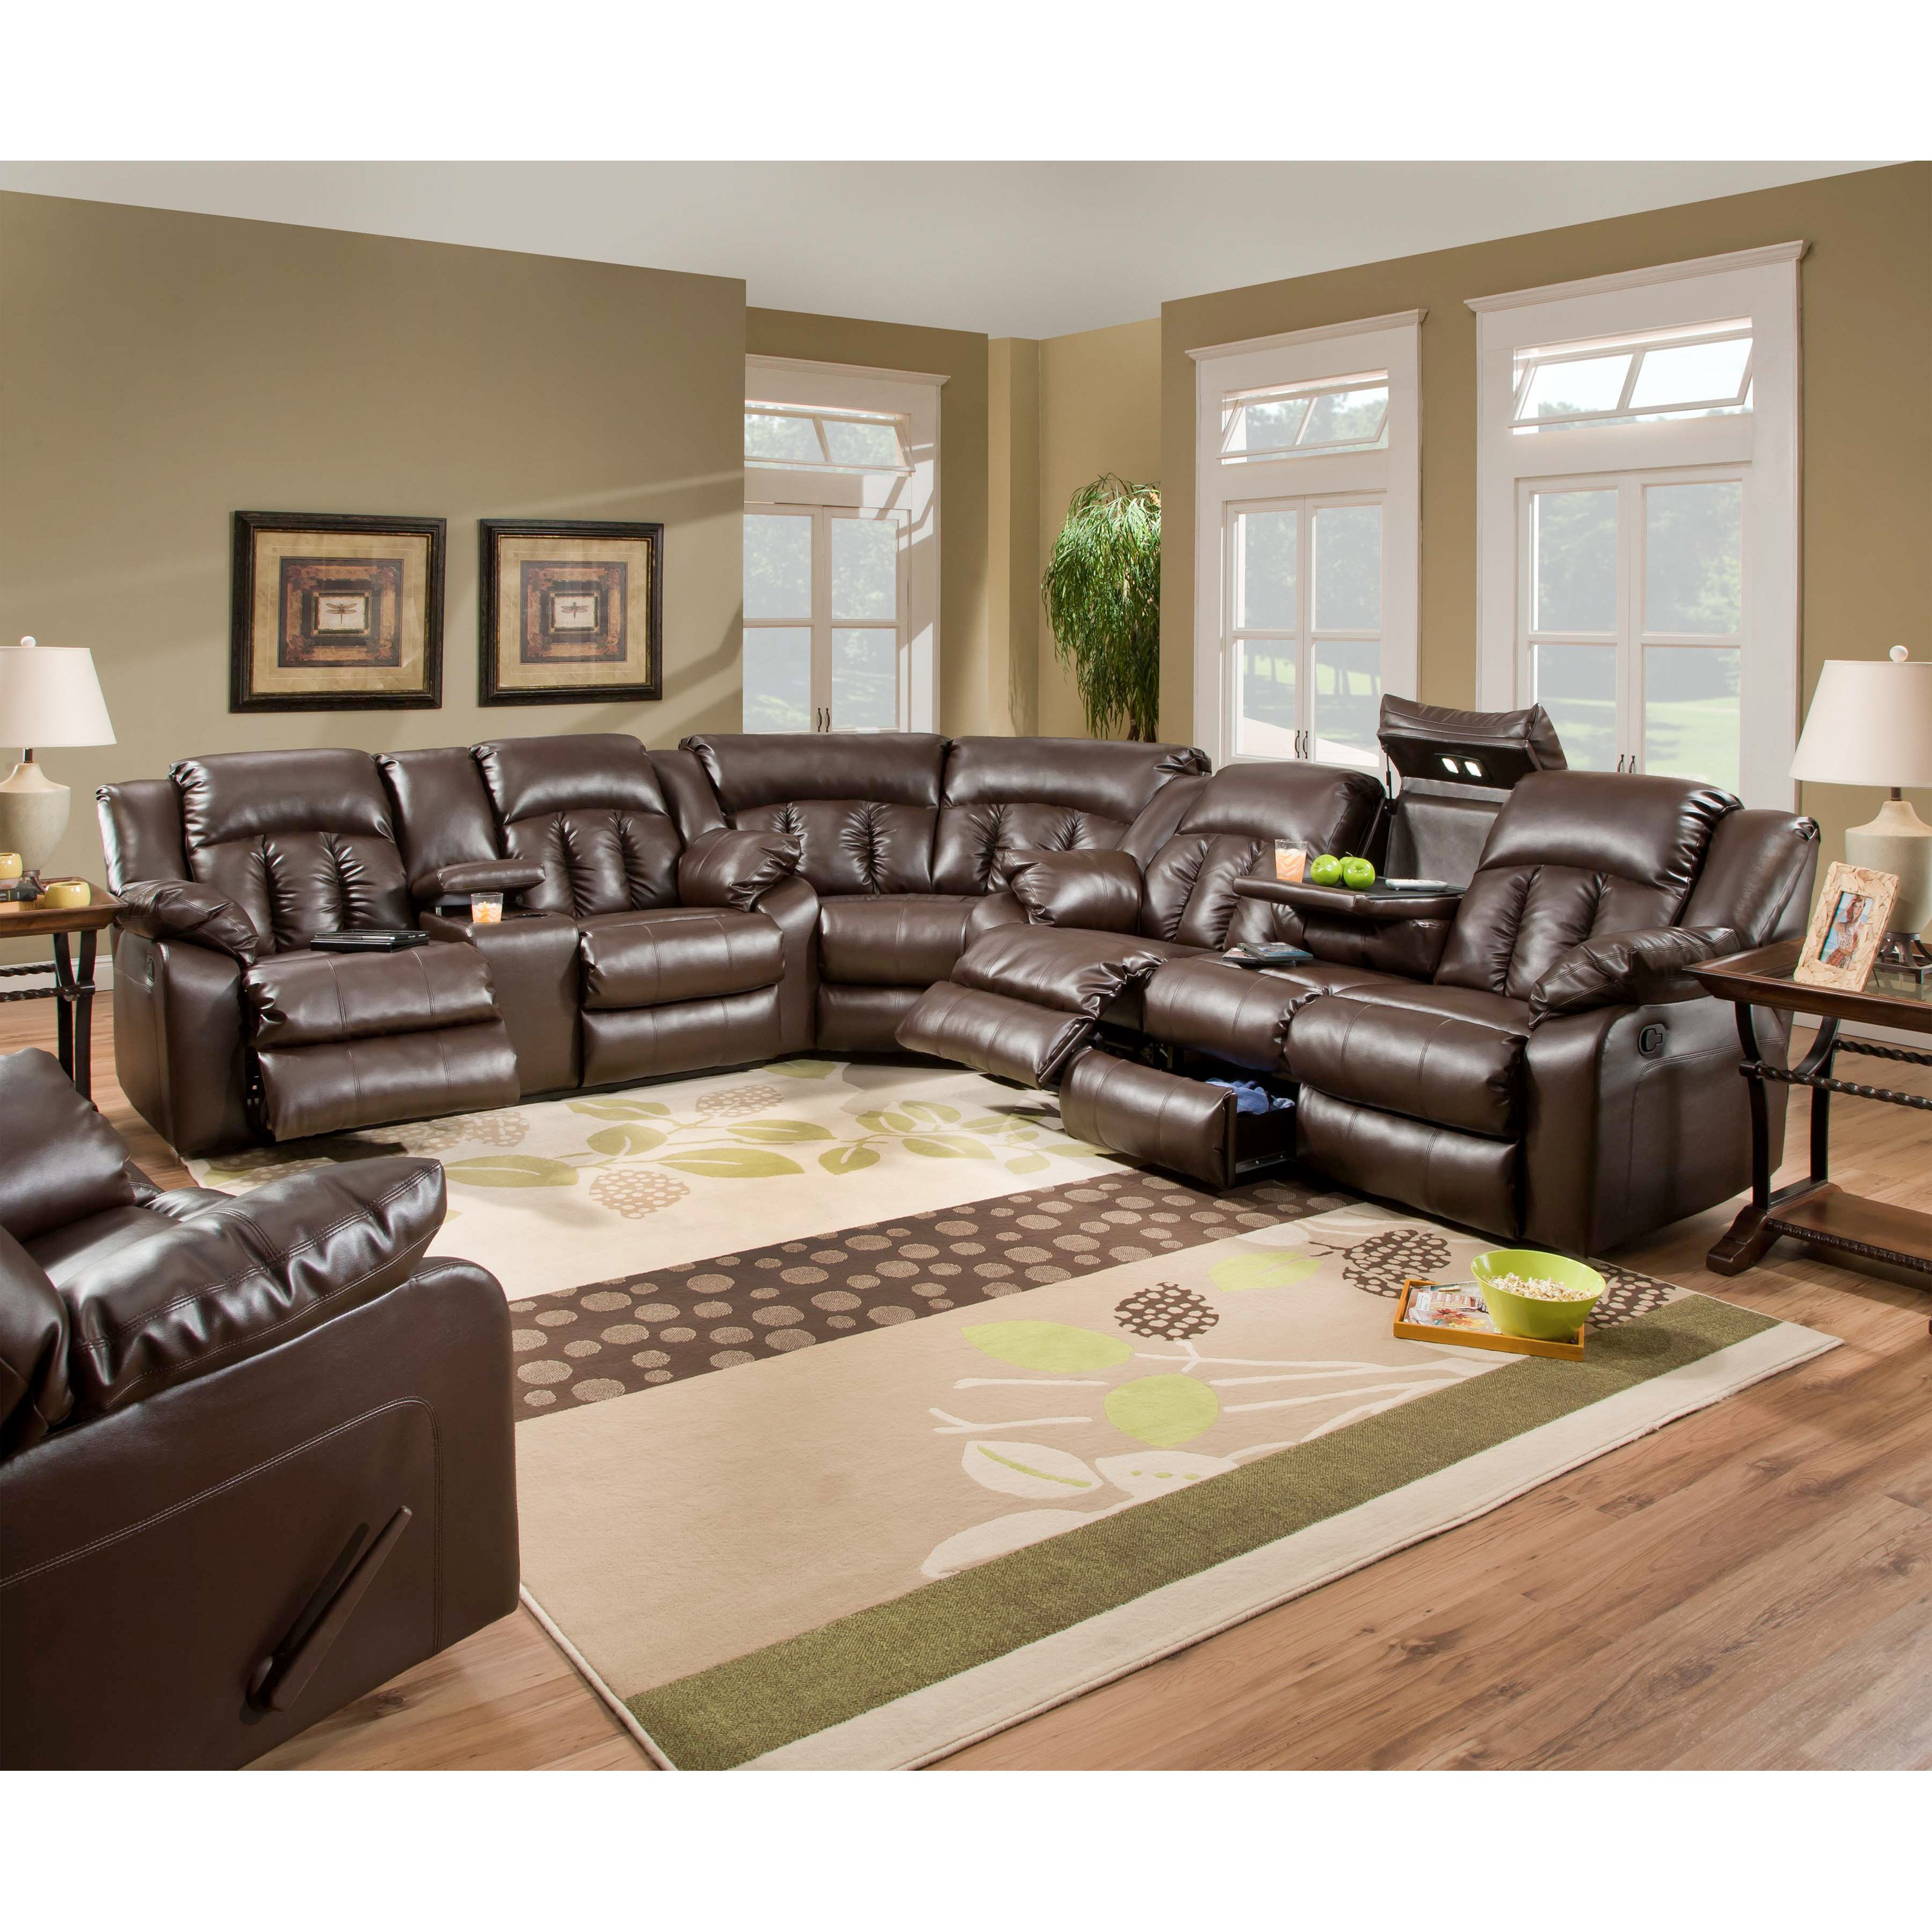 Fantastic Simmons Upholstery Sebring Bonded Leather Sectional Frankydiablos Diy Chair Ideas Frankydiabloscom